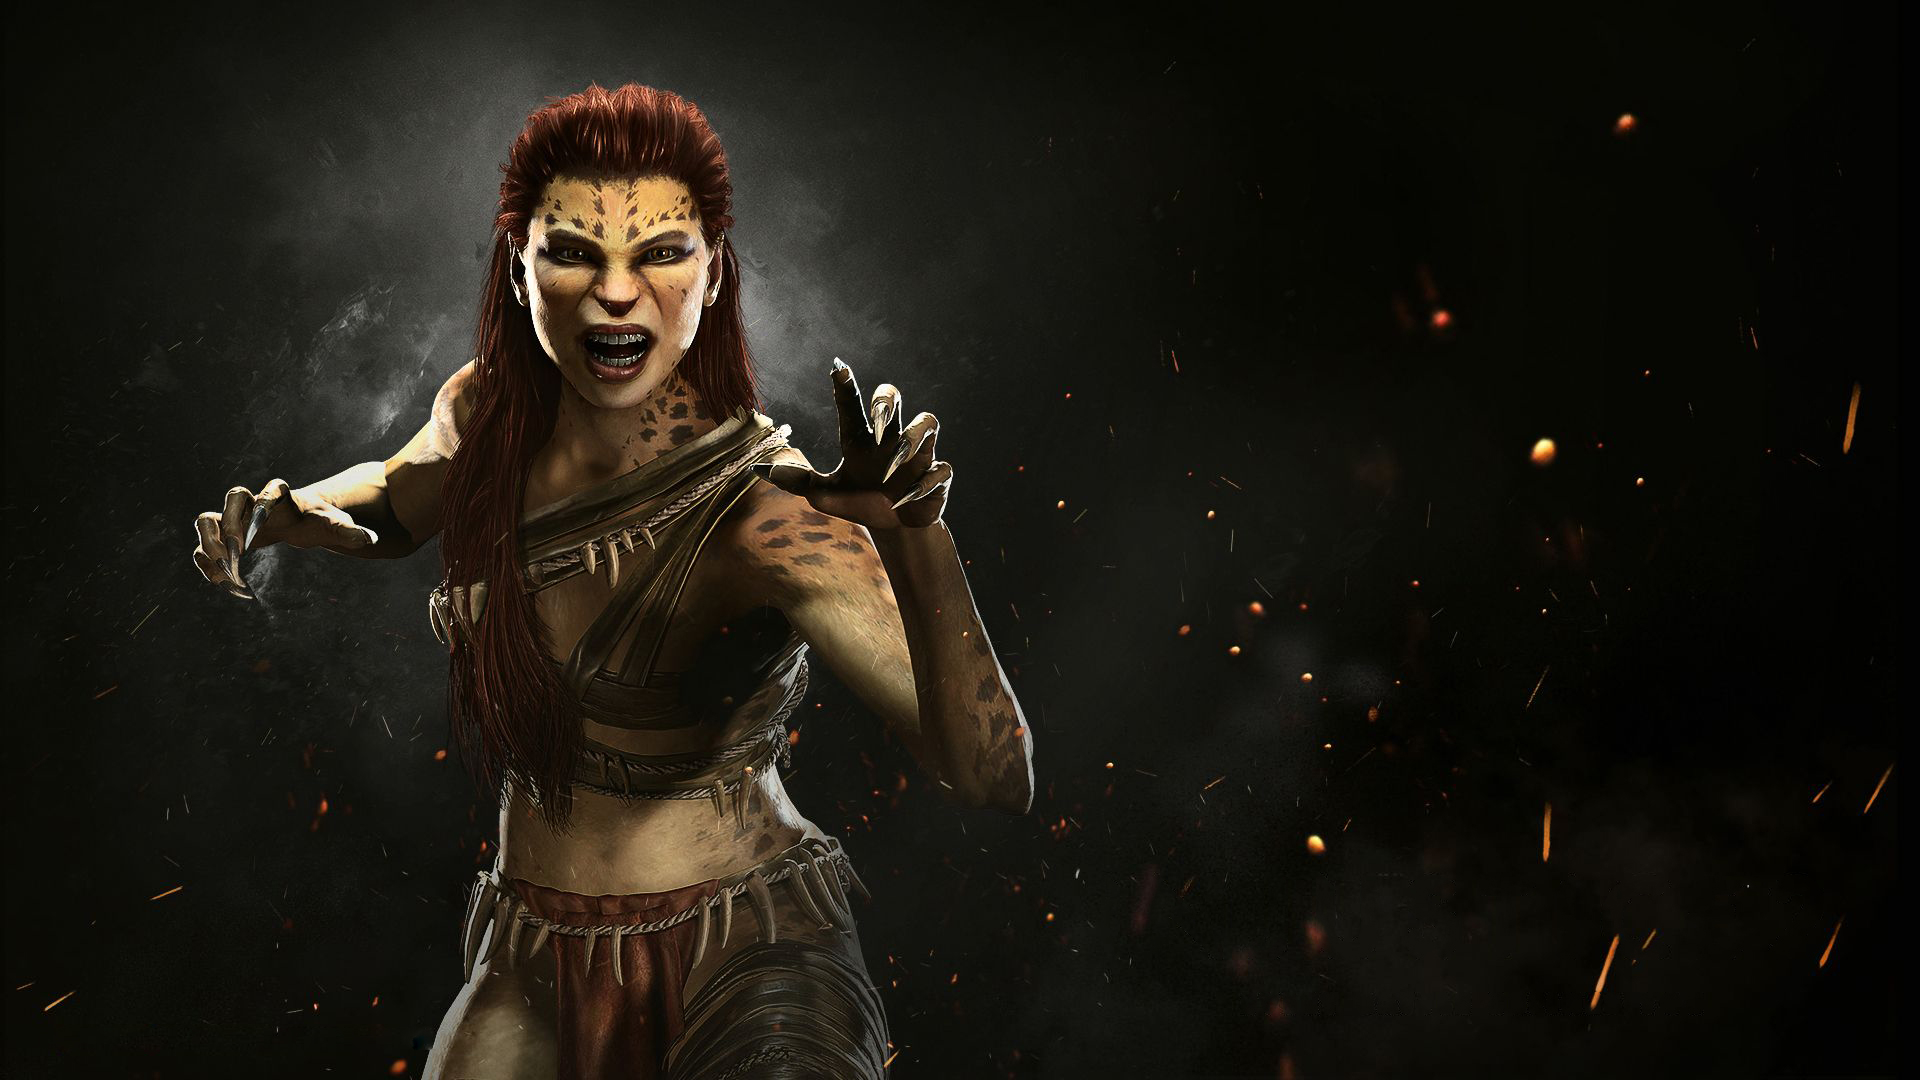 Barbara Minerva Cheetah Injustice 2 Wallpaper Hd Games 4k